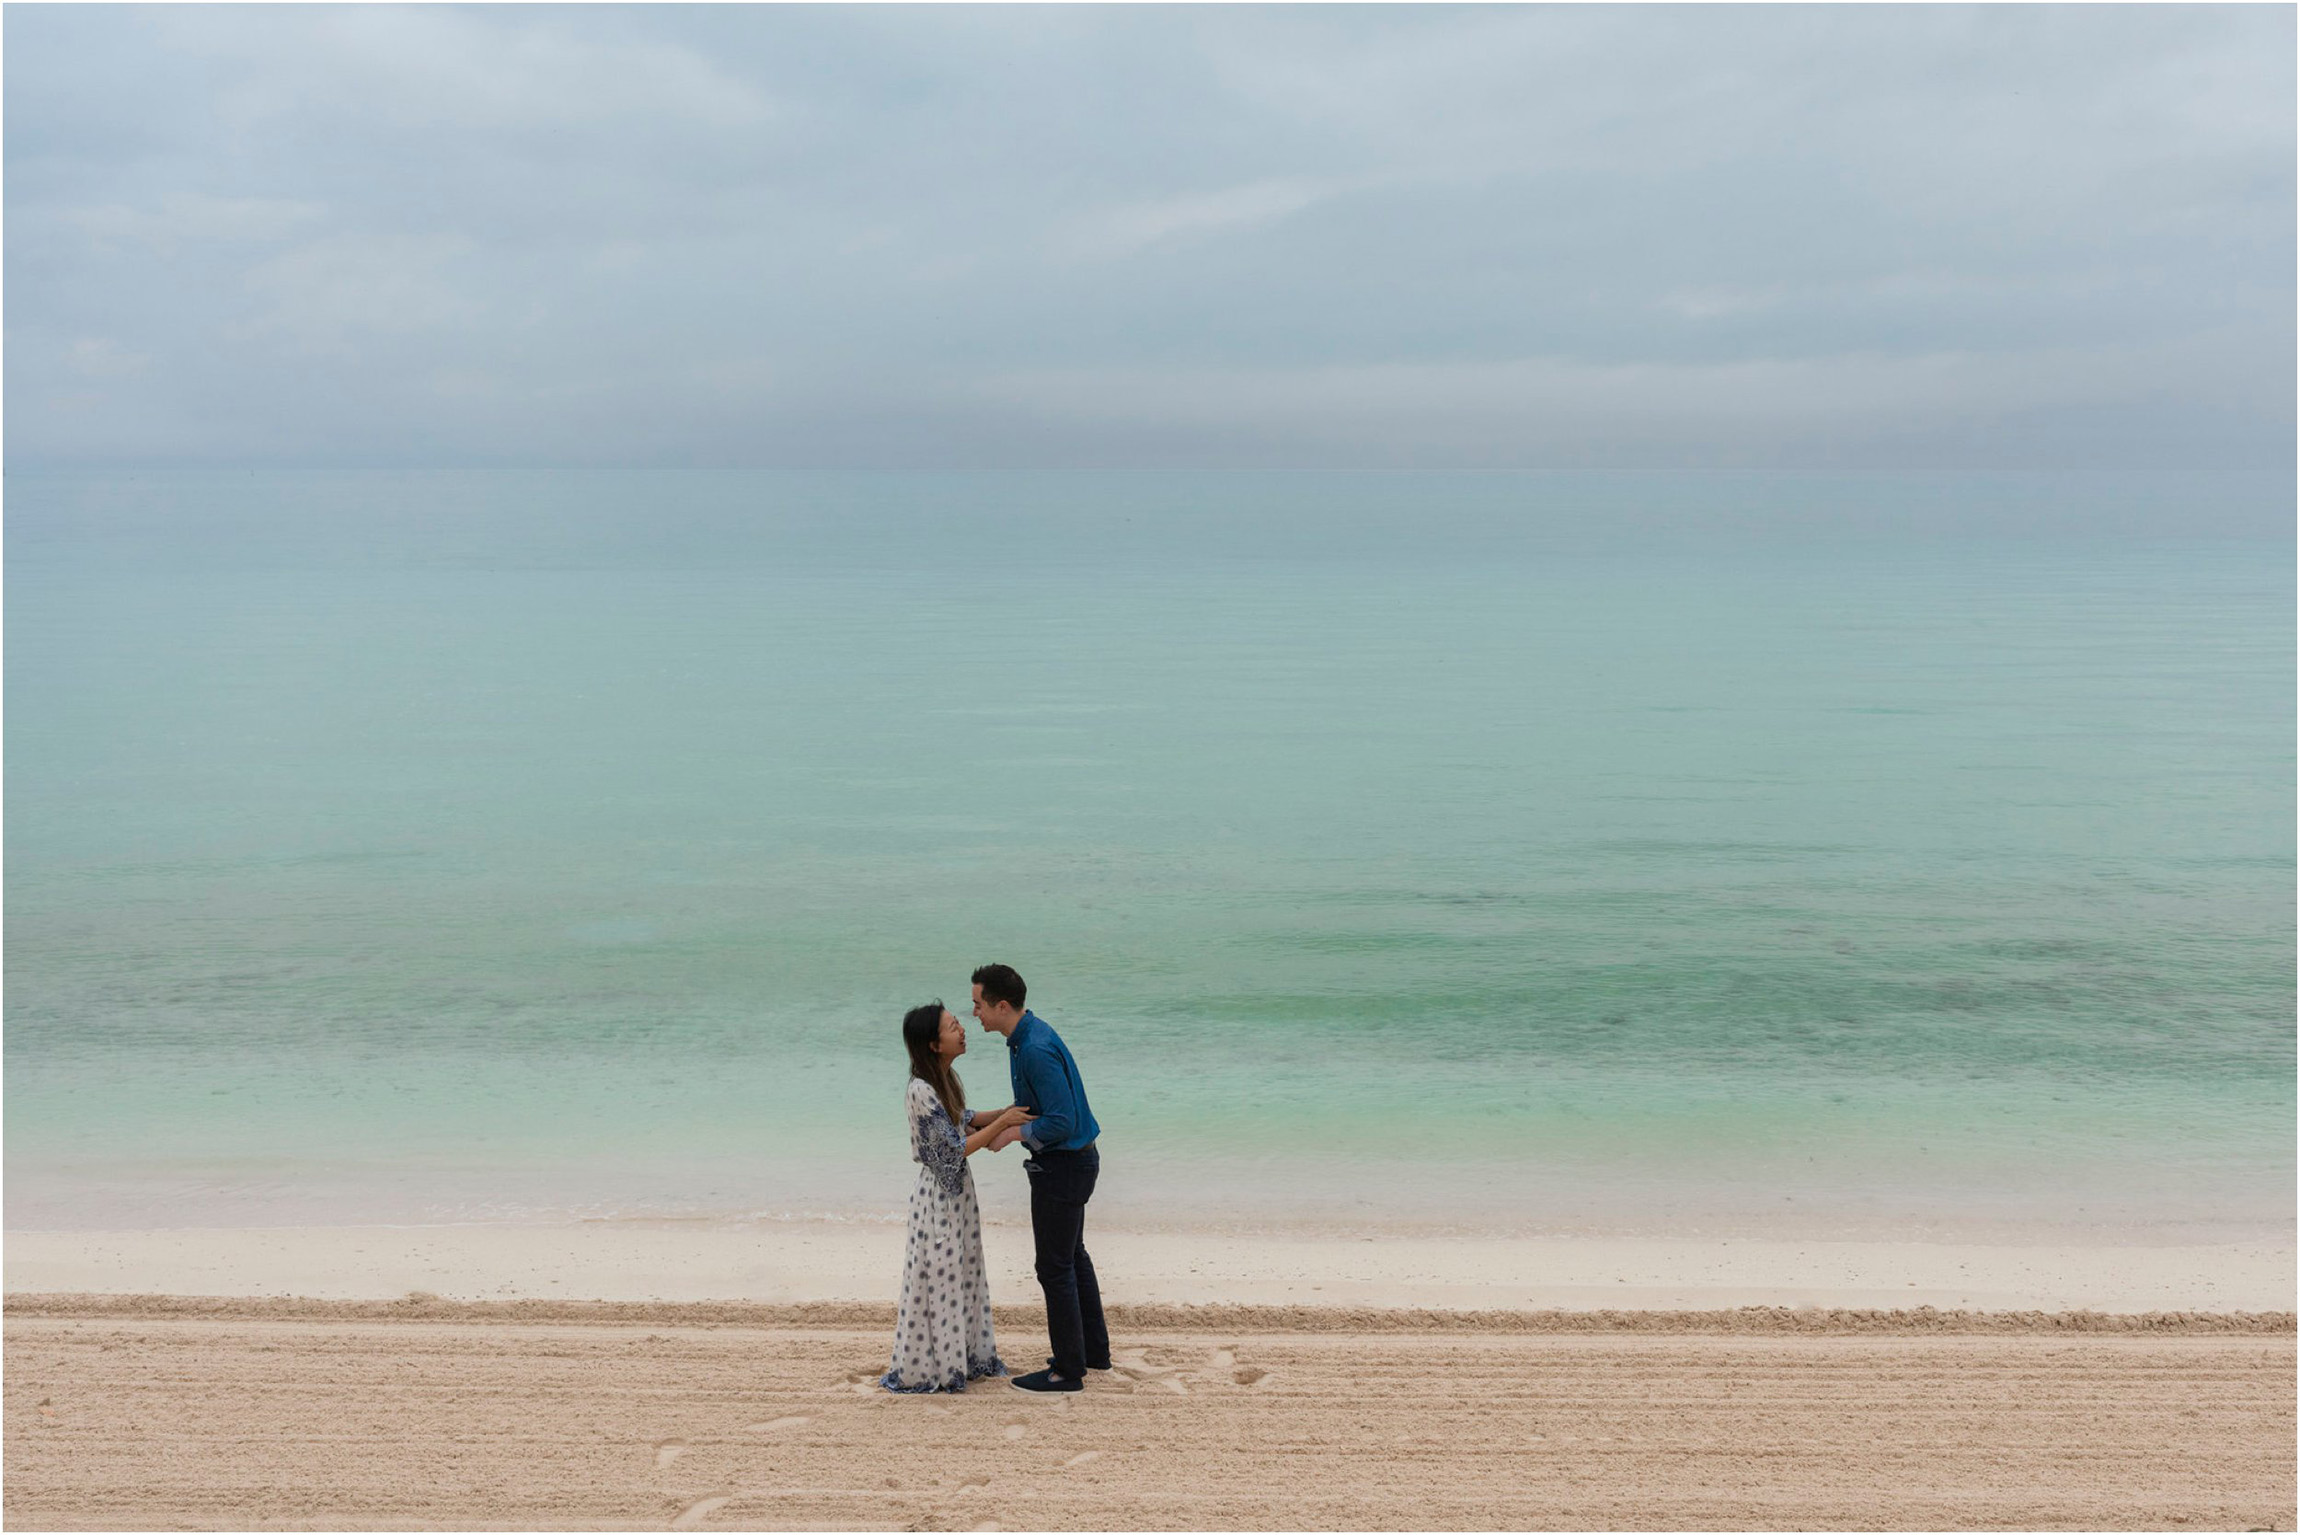 ©FianderFoto_Bermuda Proposal Photographer_Cambridge Beaches_Mason_007.jpg